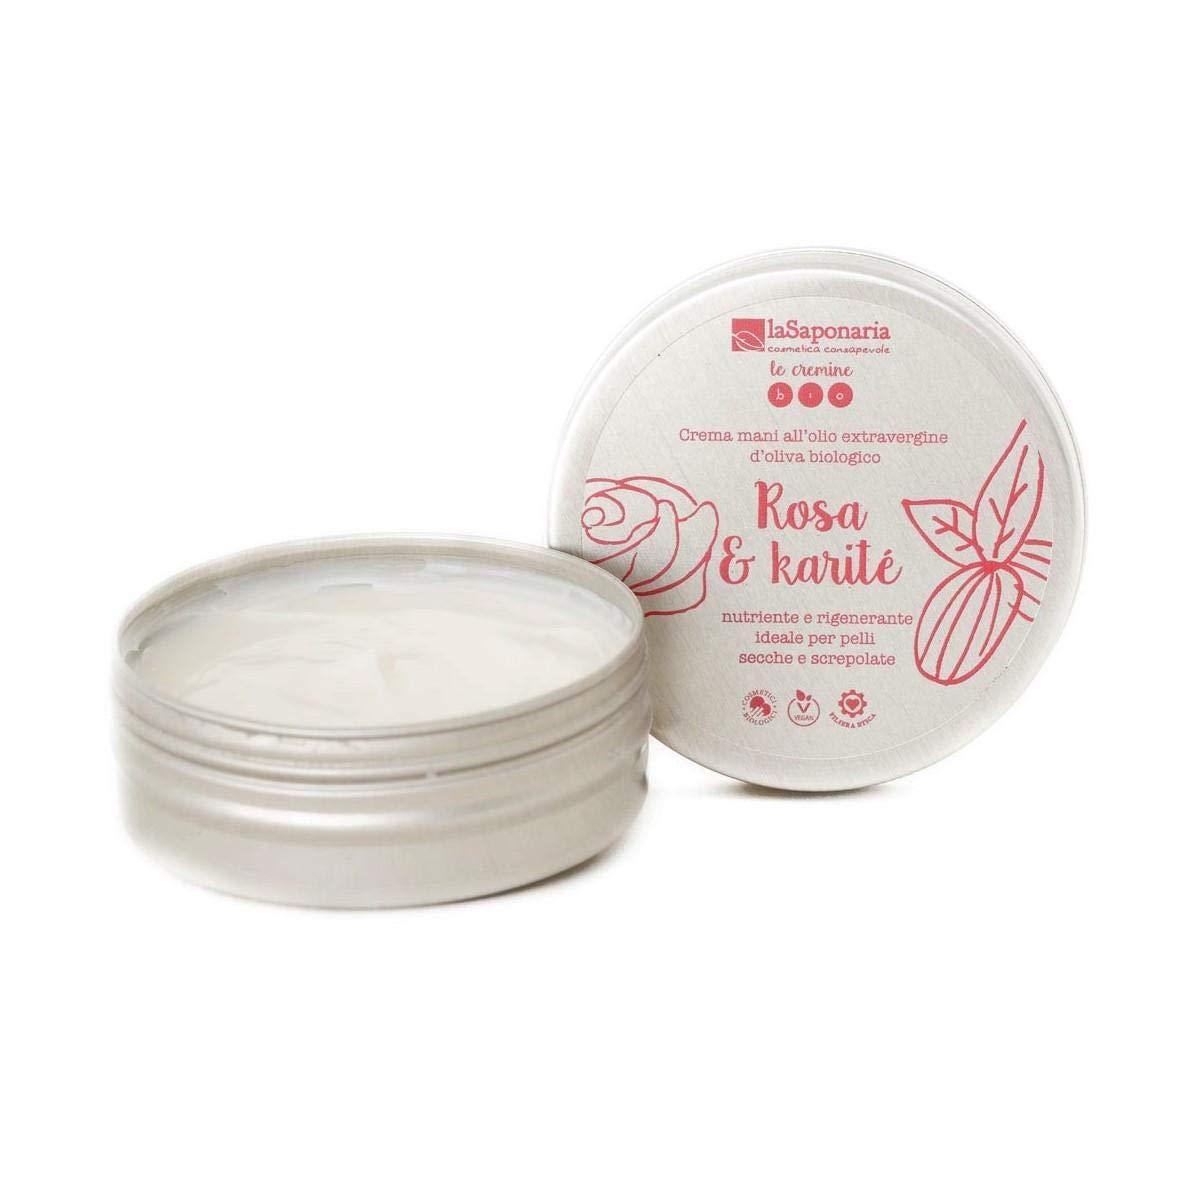 La Saponaria Softening Hand Cream Rose and Shea Butter 60ml